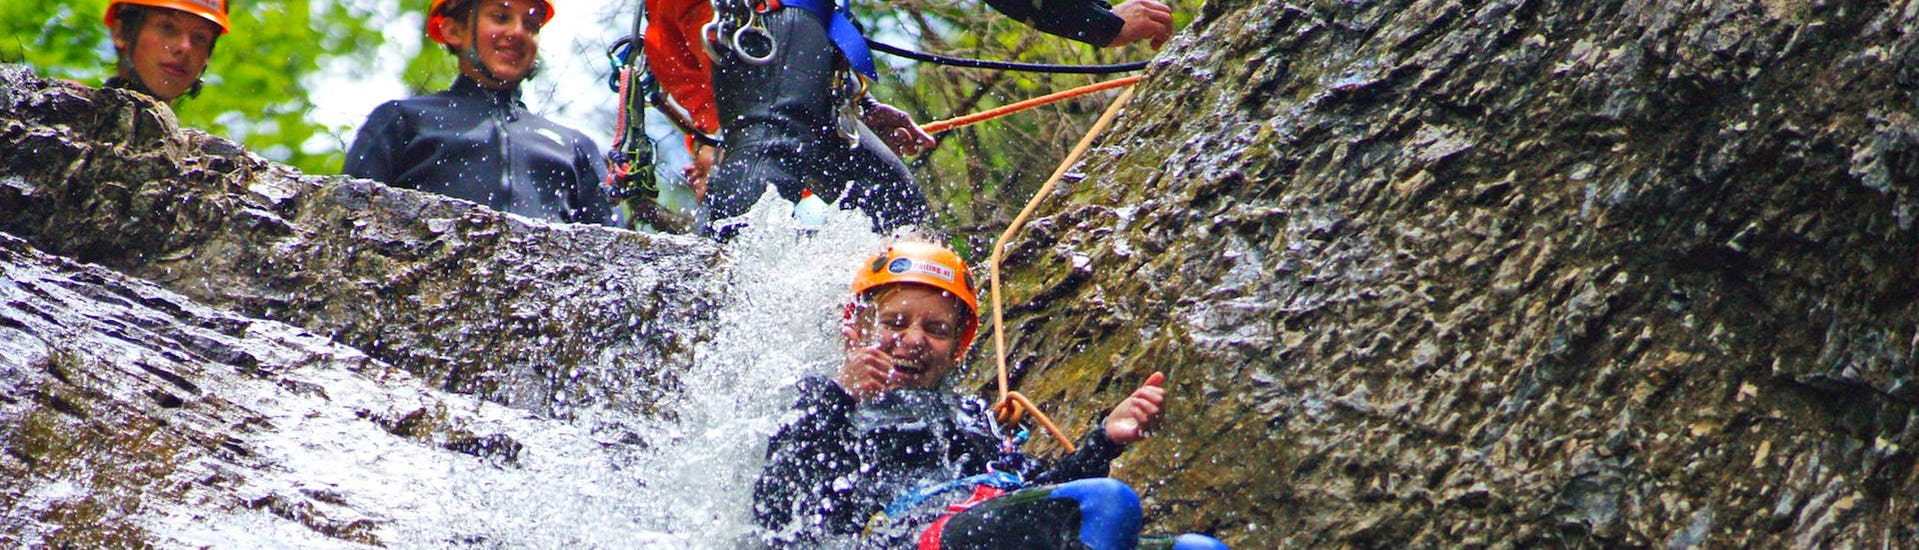 canyoning-funtastic-erbsattel-adventure-outdoor-strobl-hero